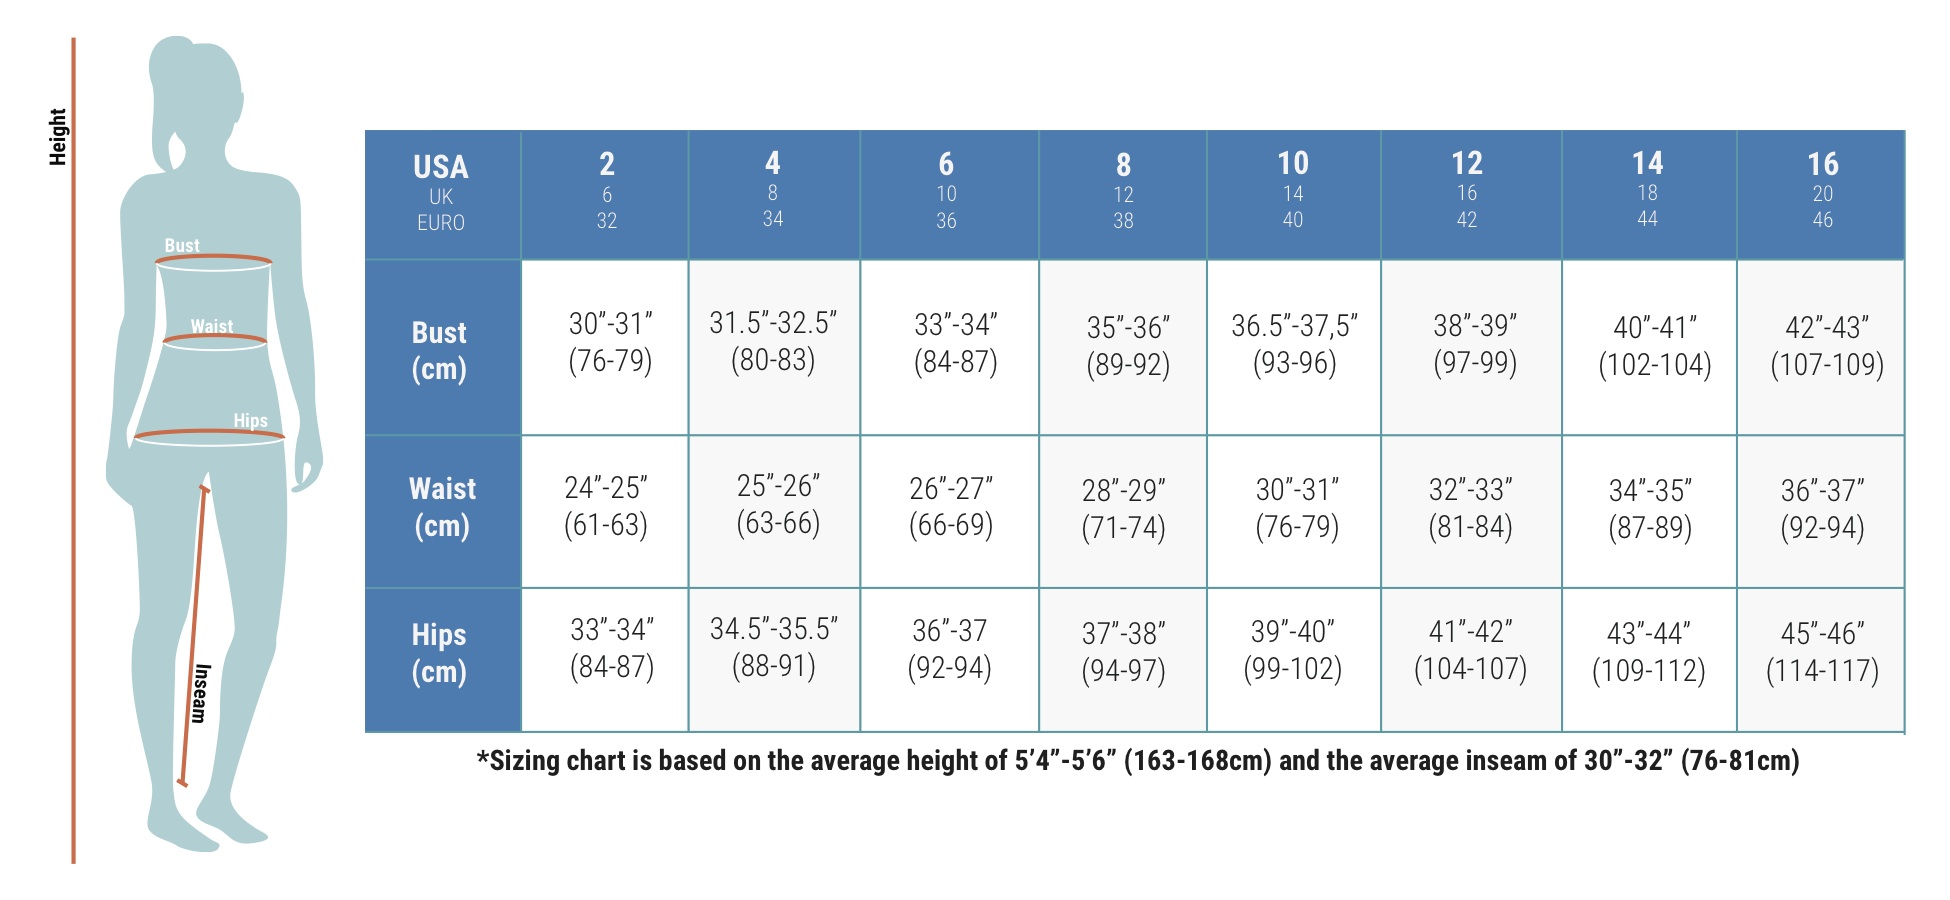 fwg-gill-womens-sizing-chart.jpg